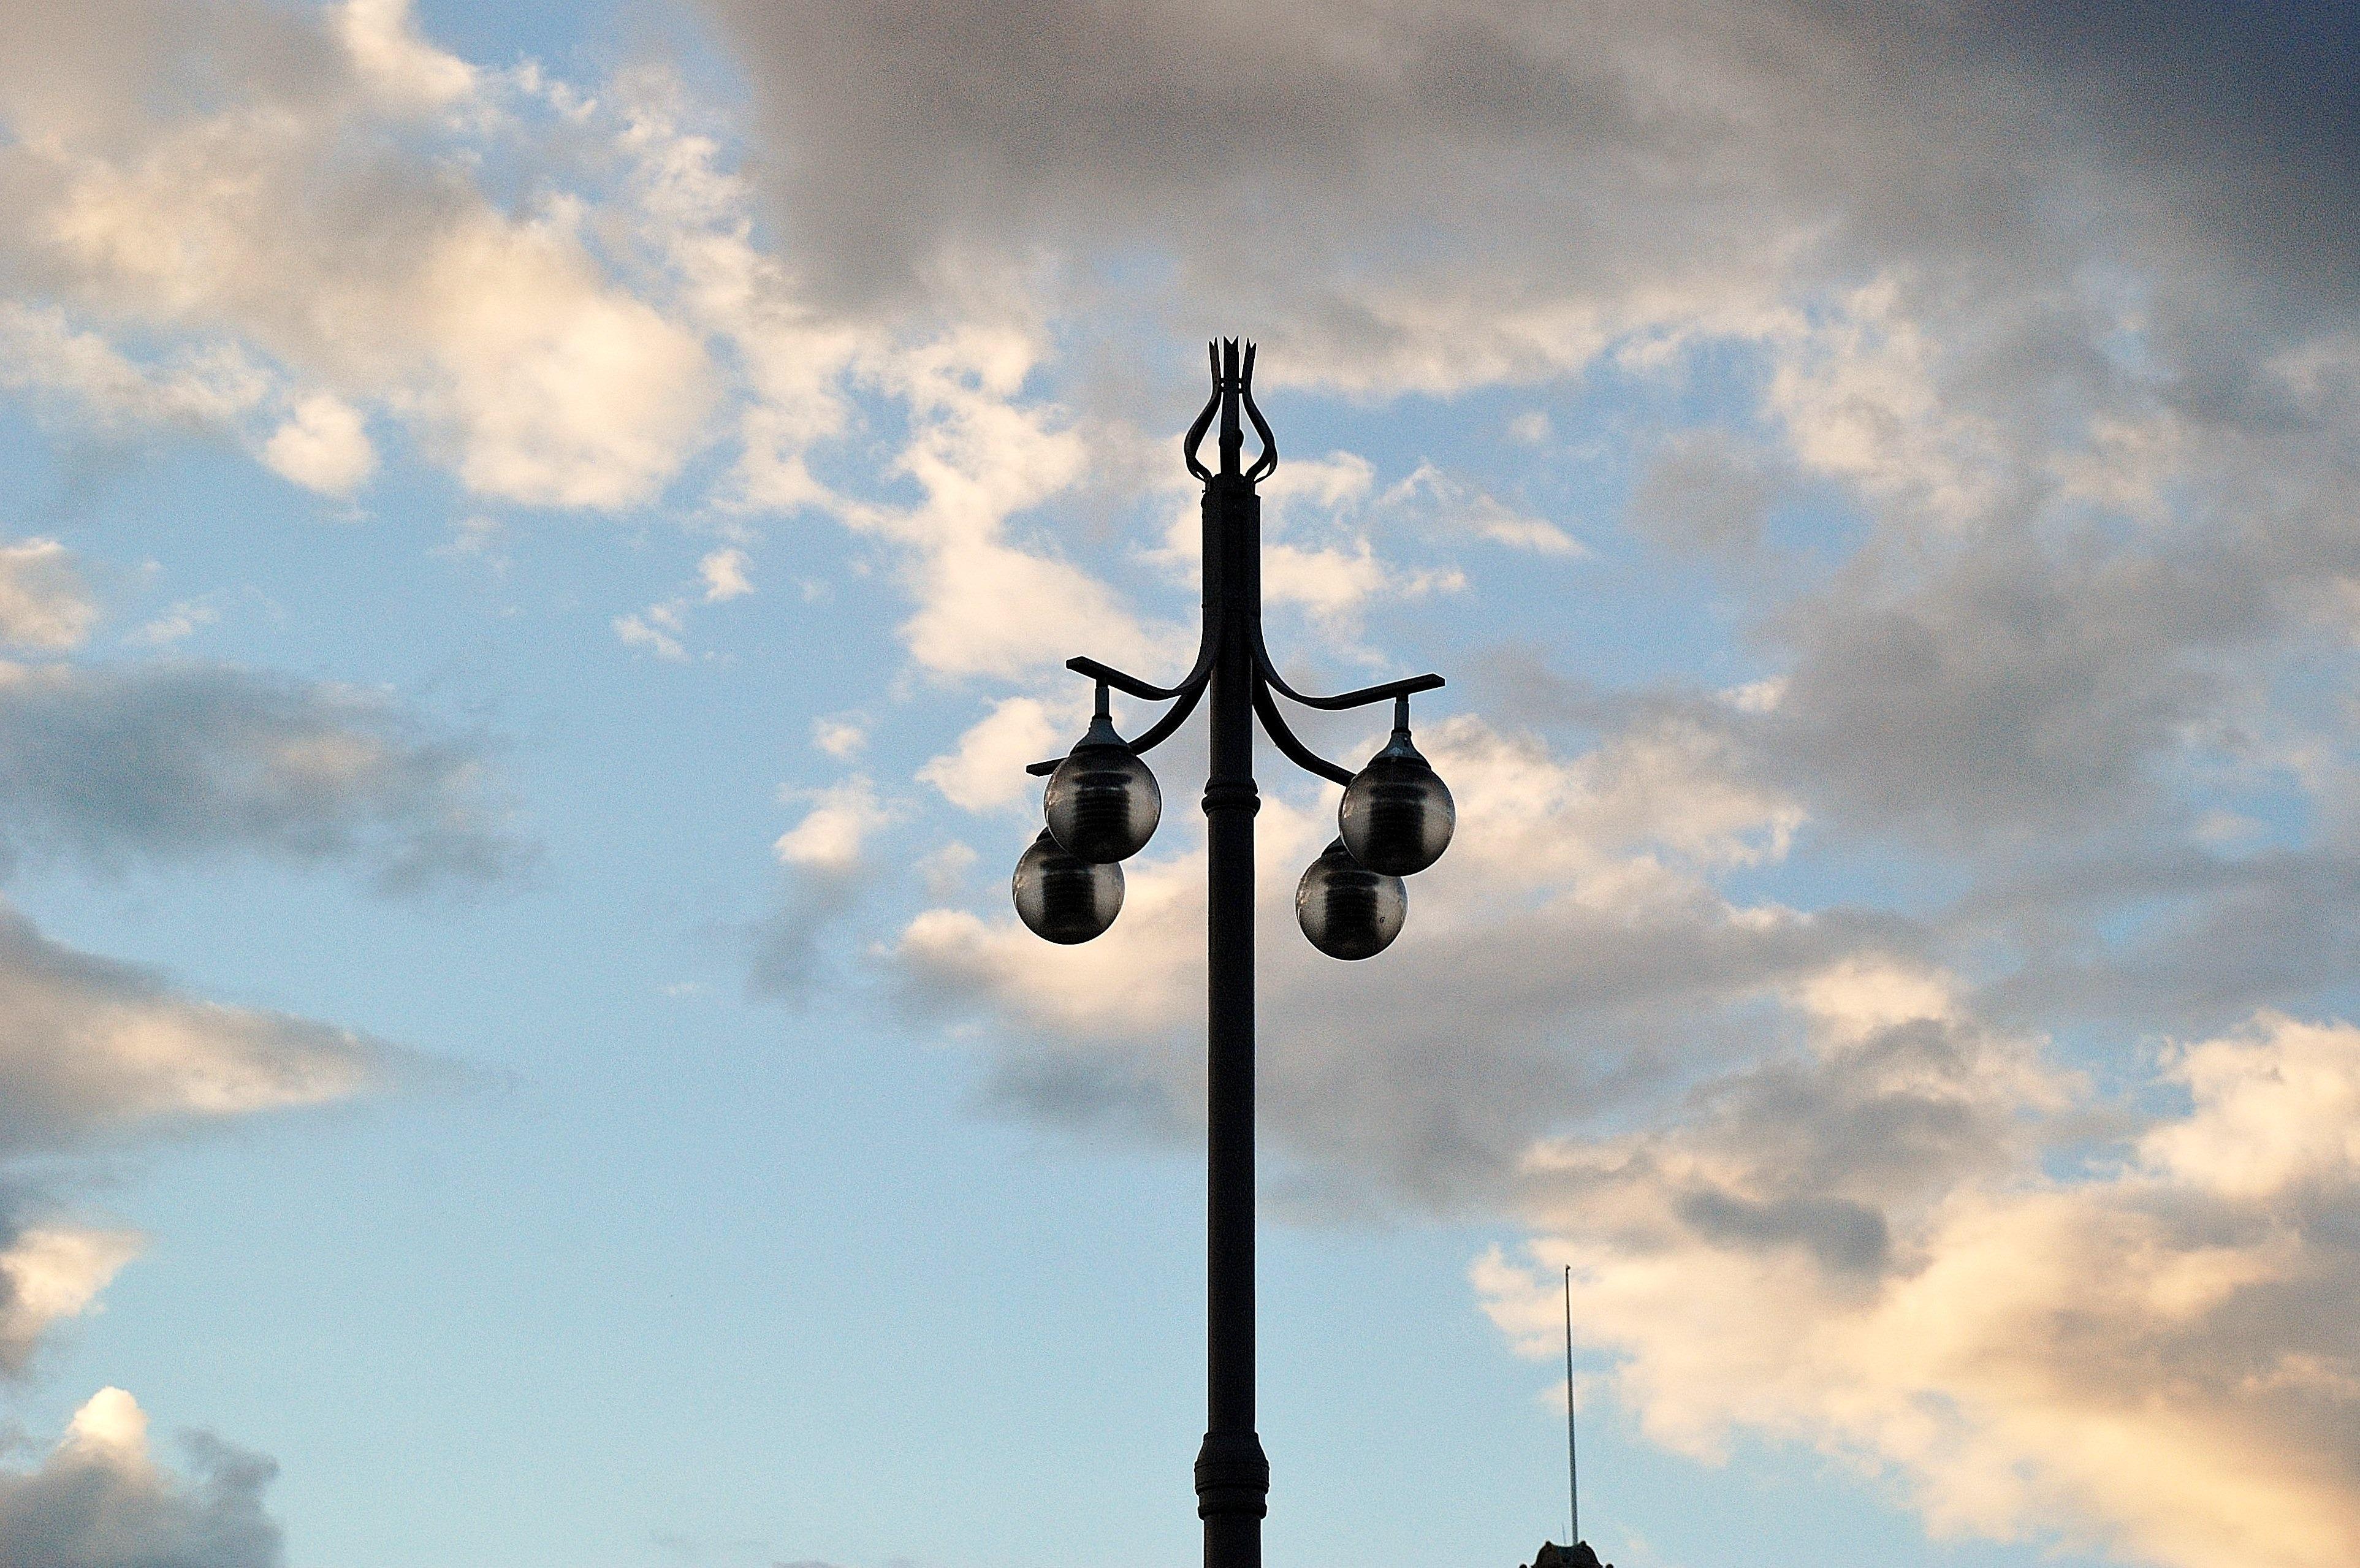 Free Images Cloud Sky Sunlight Wind Old Lantern Mast Wiring A Lamp Earth Light Street Machine Blue Hanging Lighting